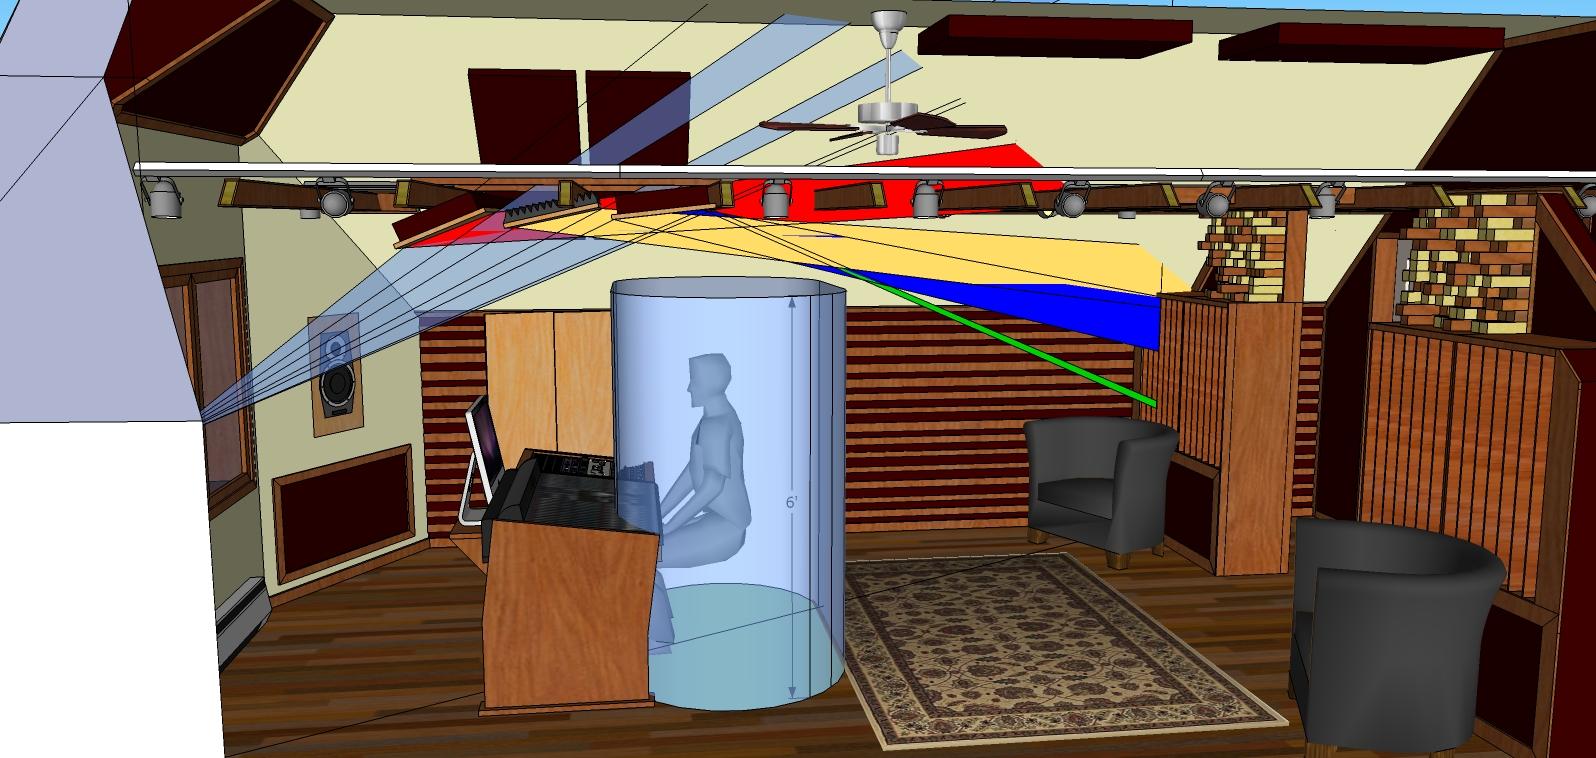 Remarkable Control Room Build Modes Soffits Slat Walls Etc Page 6 Largest Home Design Picture Inspirations Pitcheantrous